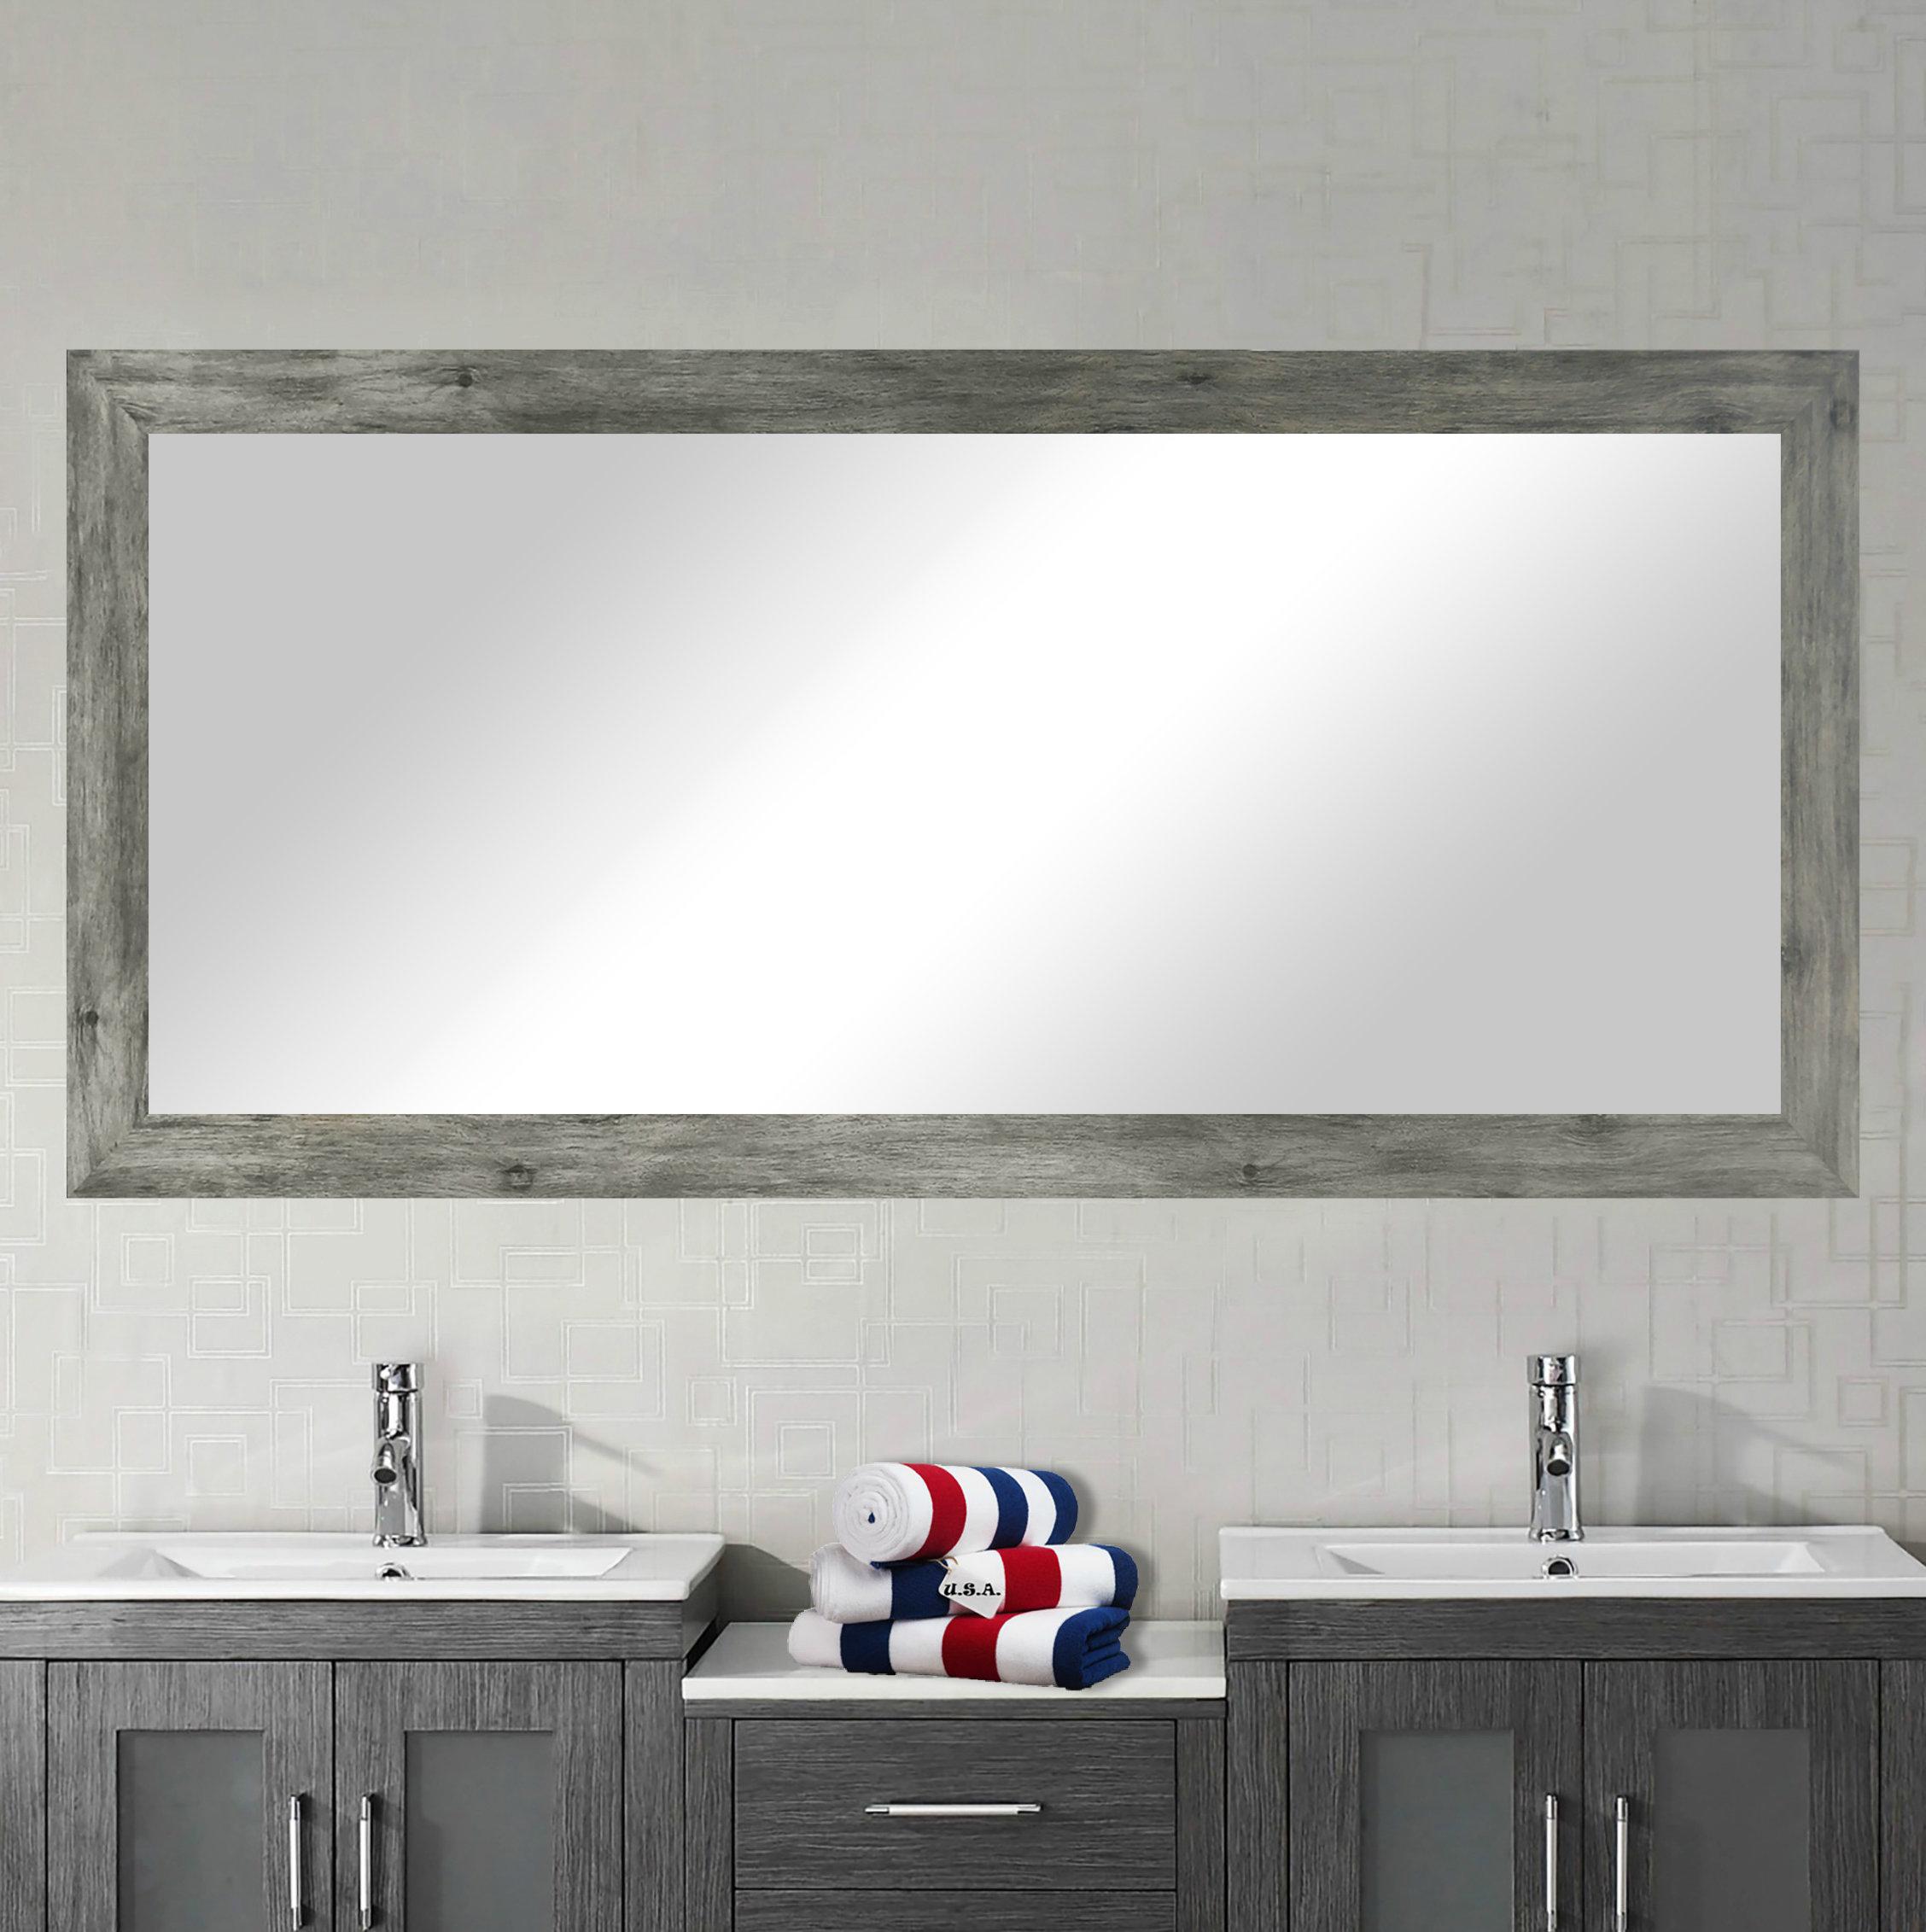 Landover Rustic Distressed Bathroom/vanity Mirror Regarding Longwood Rustic Beveled Accent Mirrors (View 17 of 20)